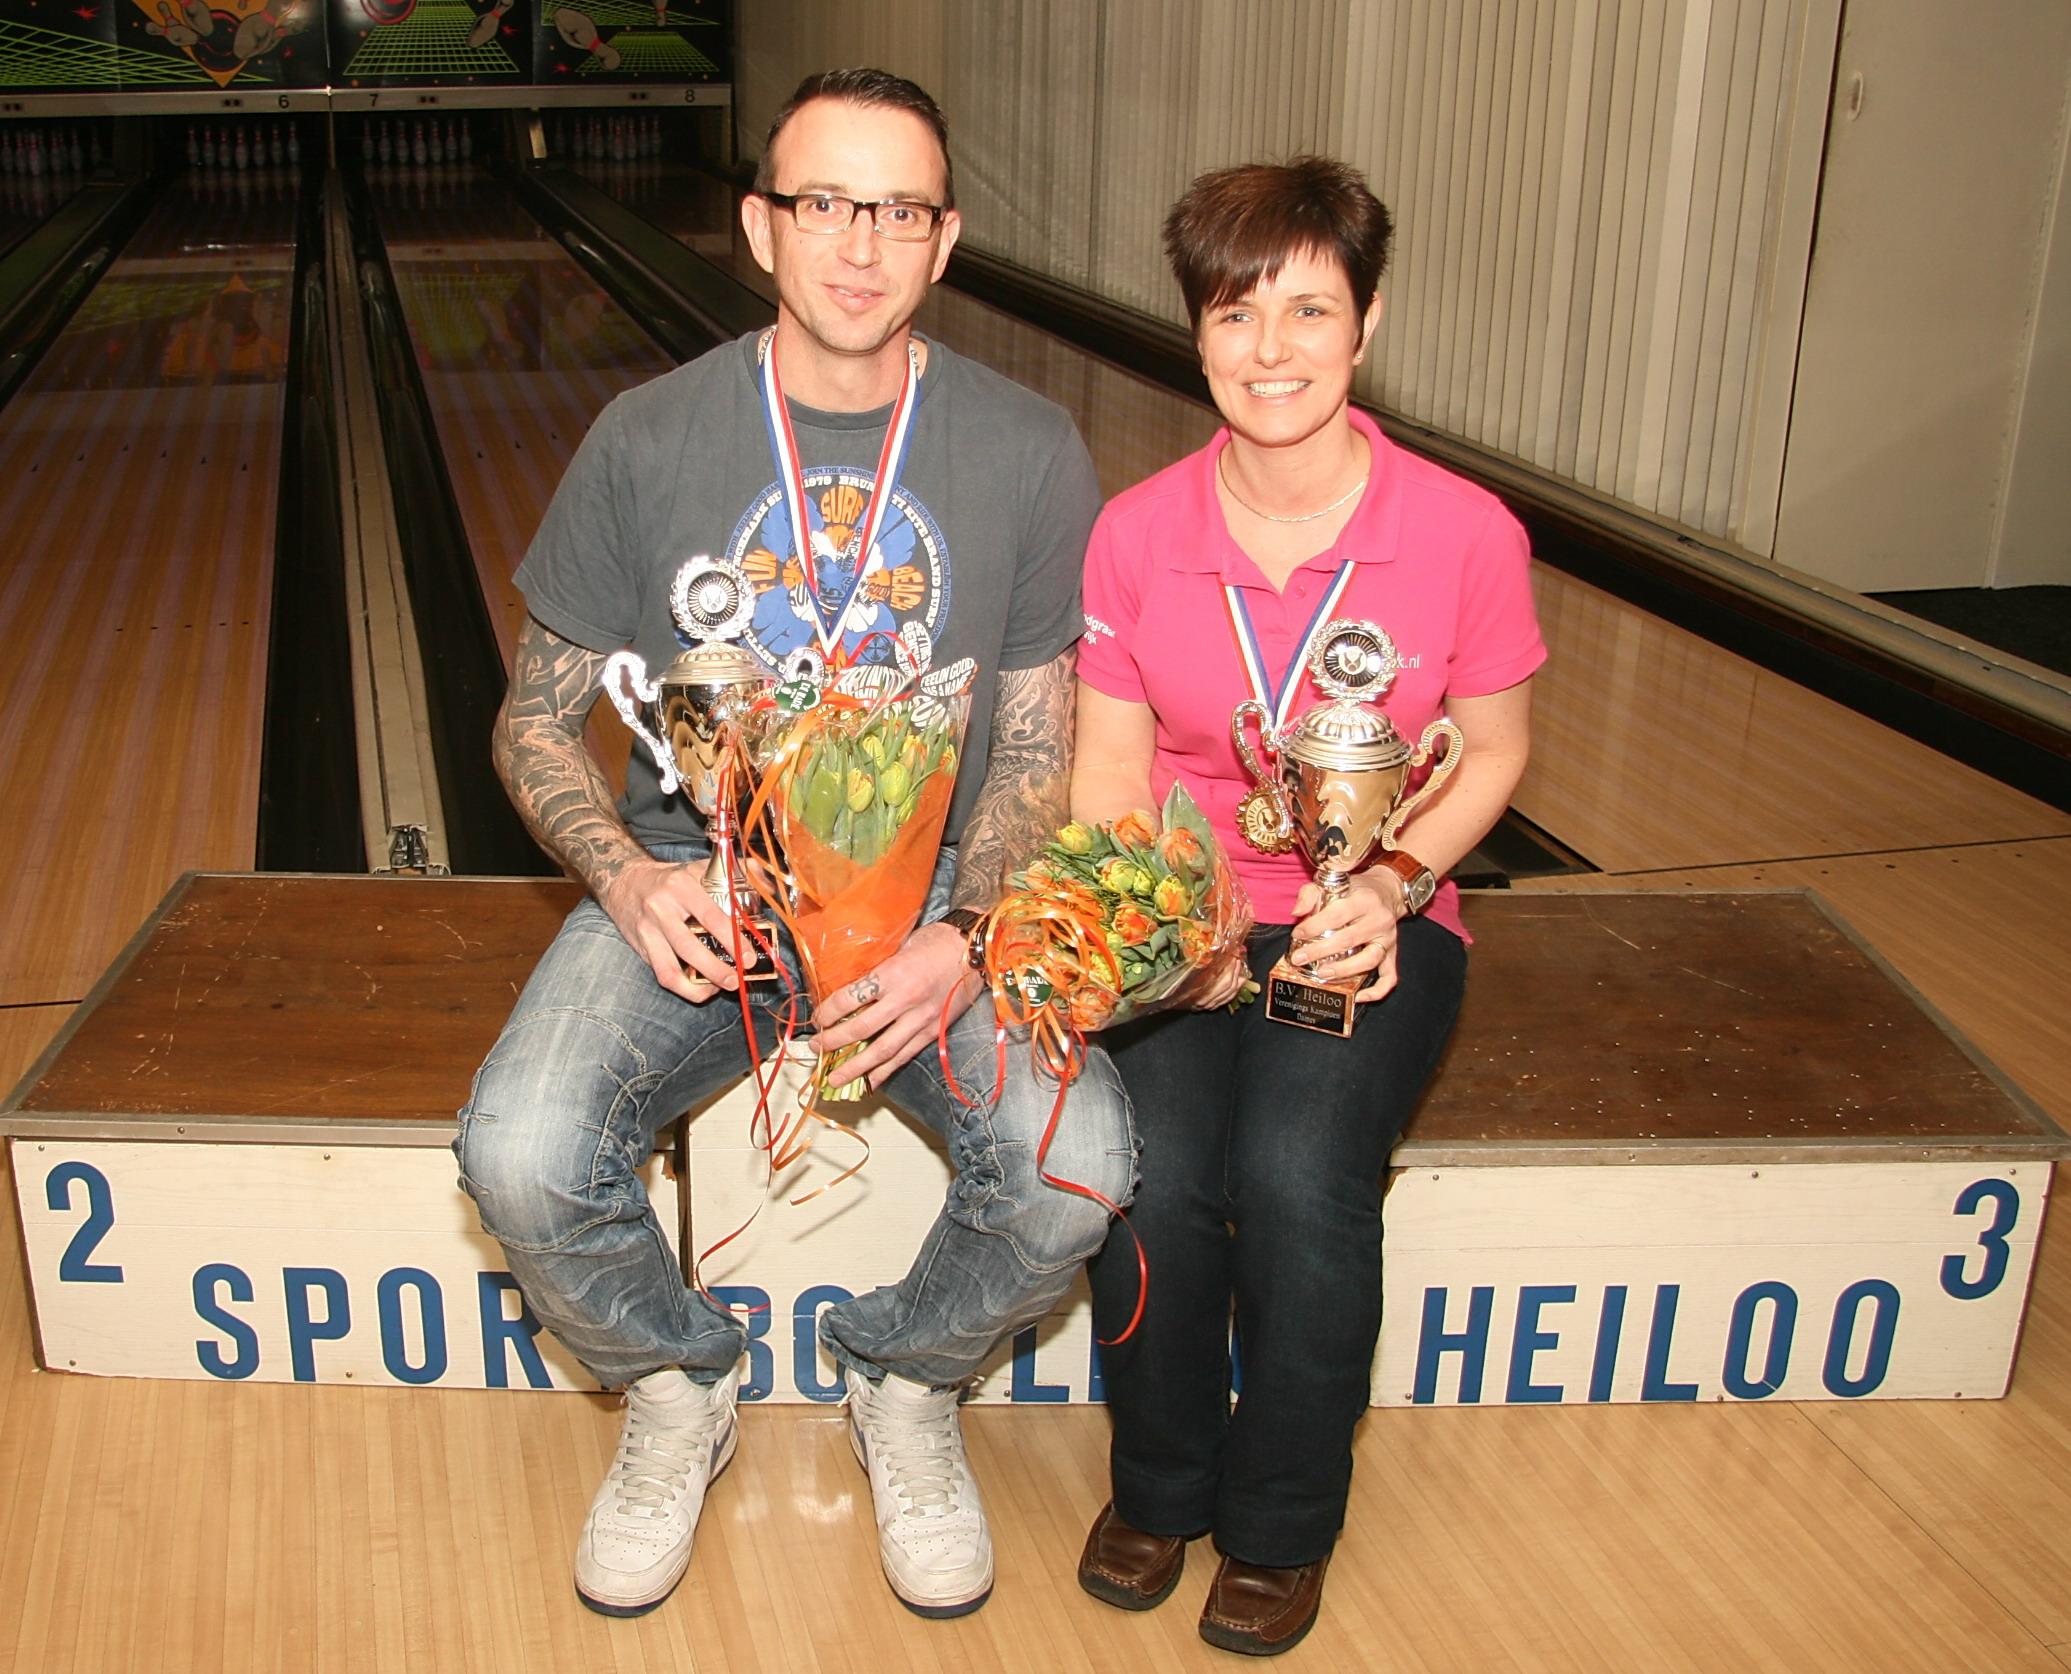 http://www.bowlingverenigingheiloo.nl/fotos_verhalen/foto's/2014_0213-Ver.kampioenen-2014.jpg